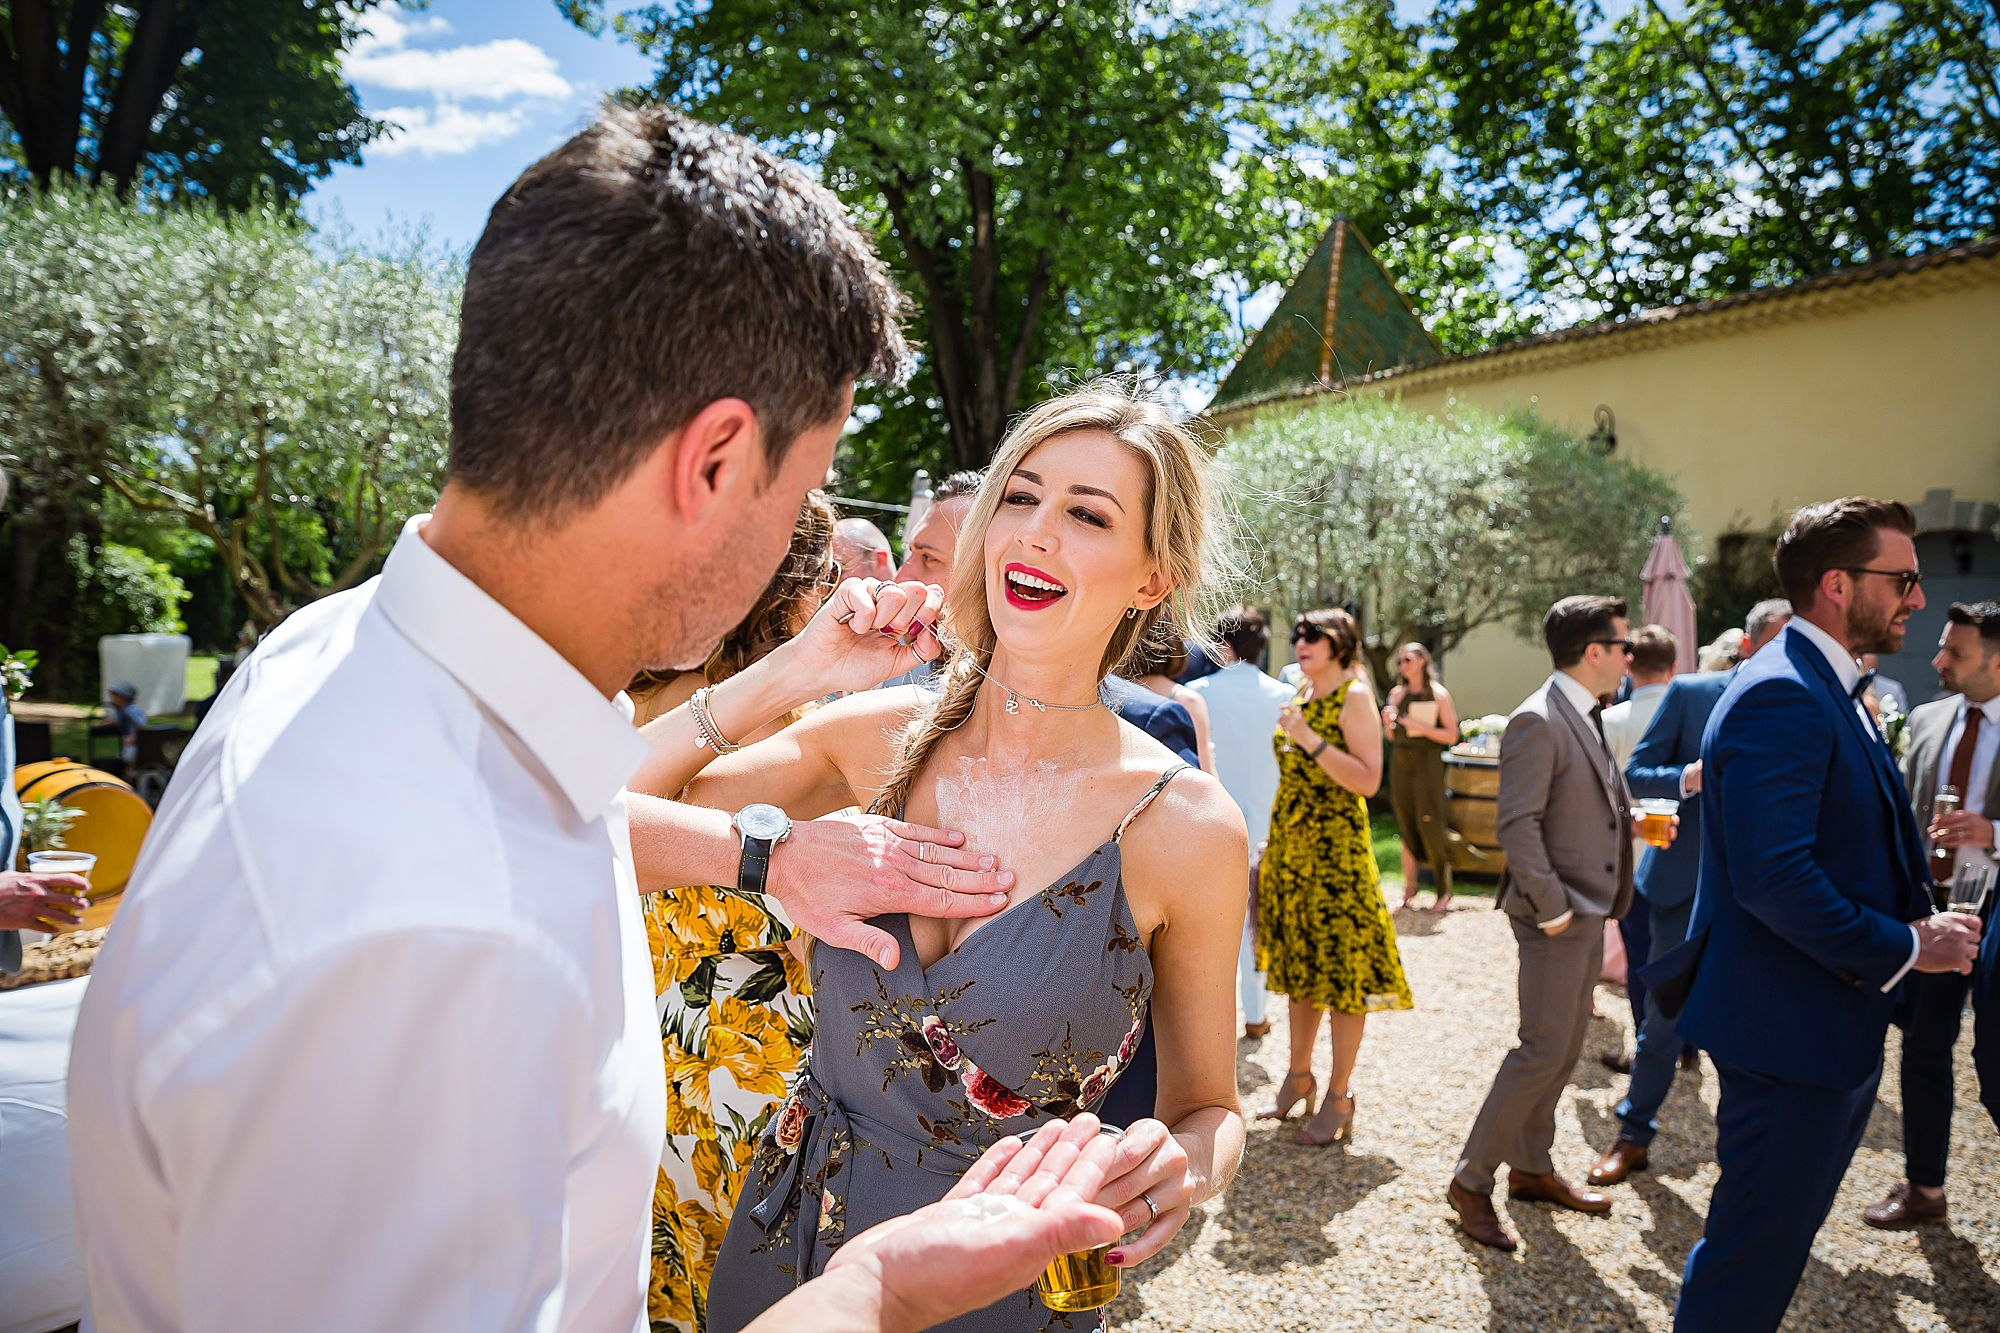 rubbing on suntan cream at Chateau Rieutort wedding